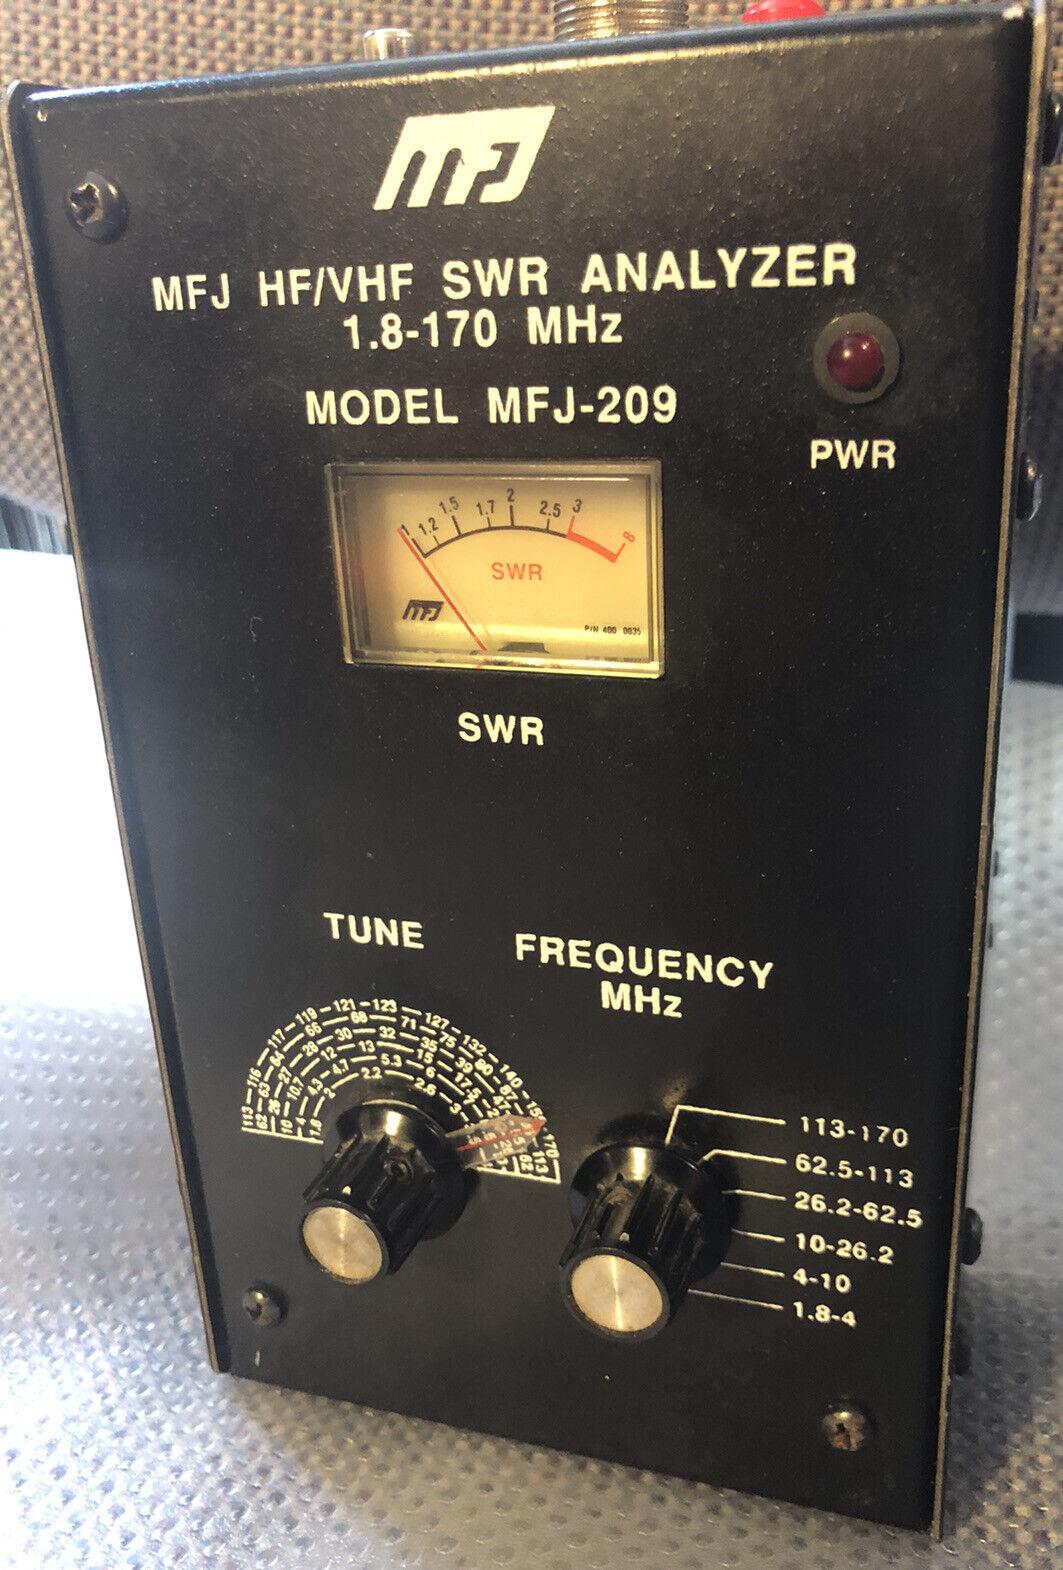 MFJ-209 HF/VHF SWR Analyzer - 1.8-170 MHz. Available Now for 100.00